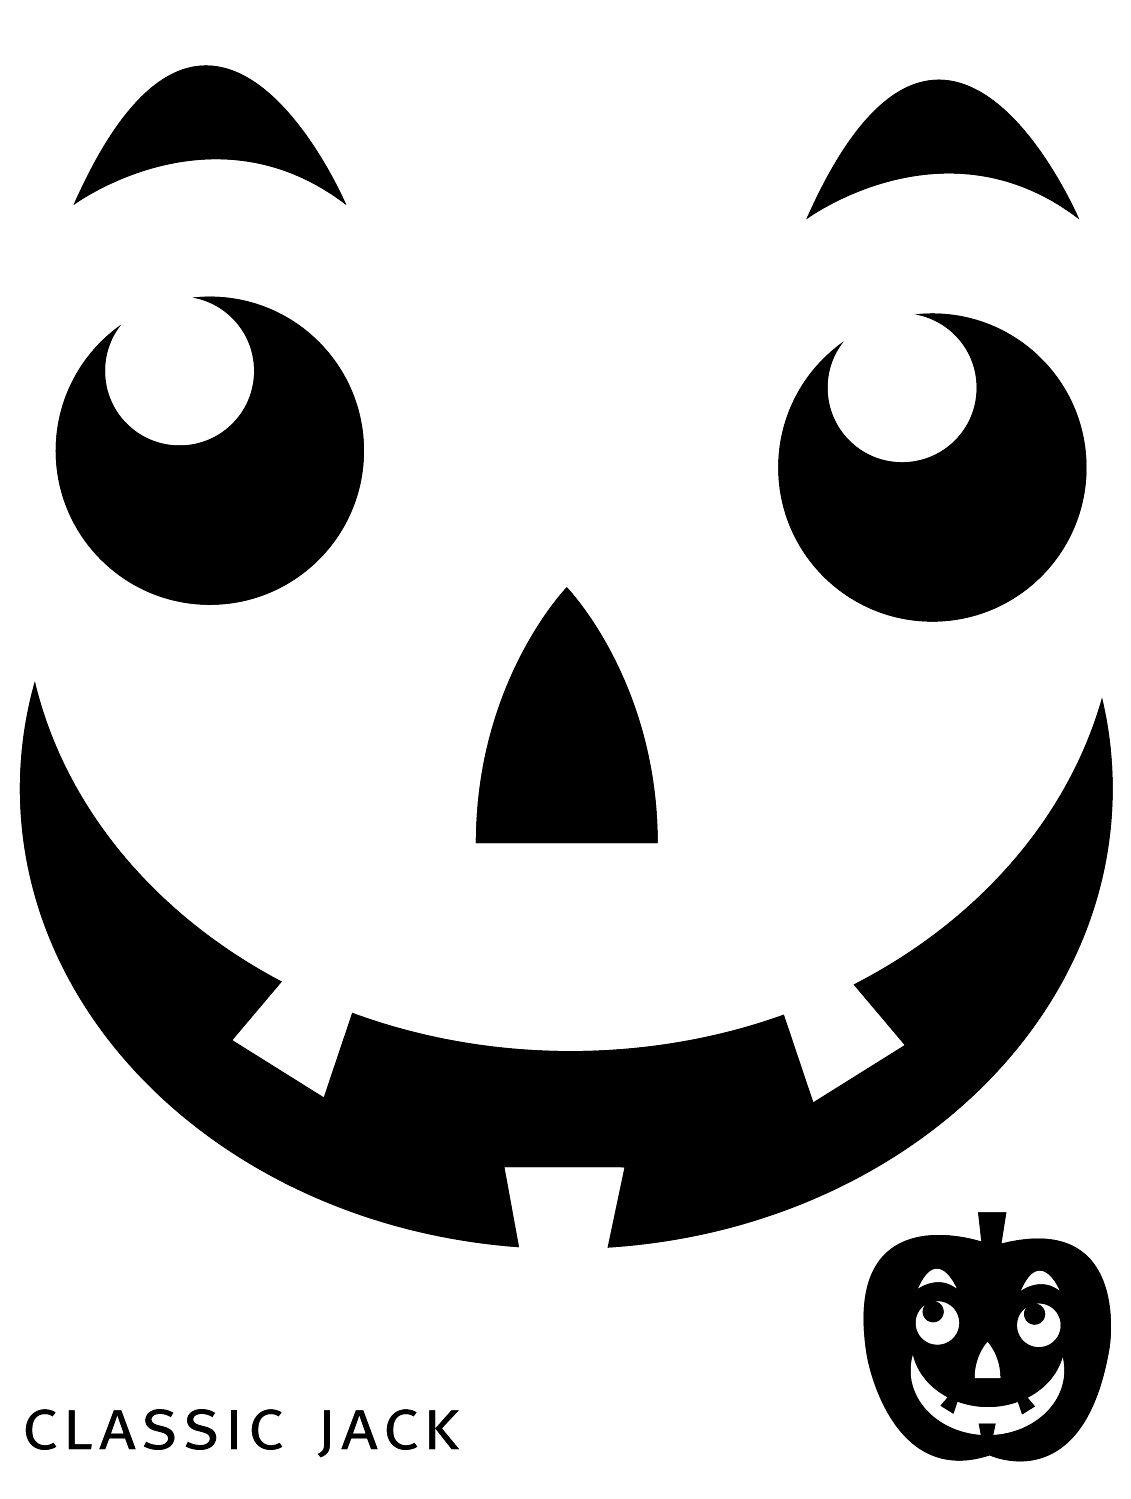 Free Printable Easy Funny Jack O Lantern Face Stencils Patterns - Free Printable Pumpkin Faces